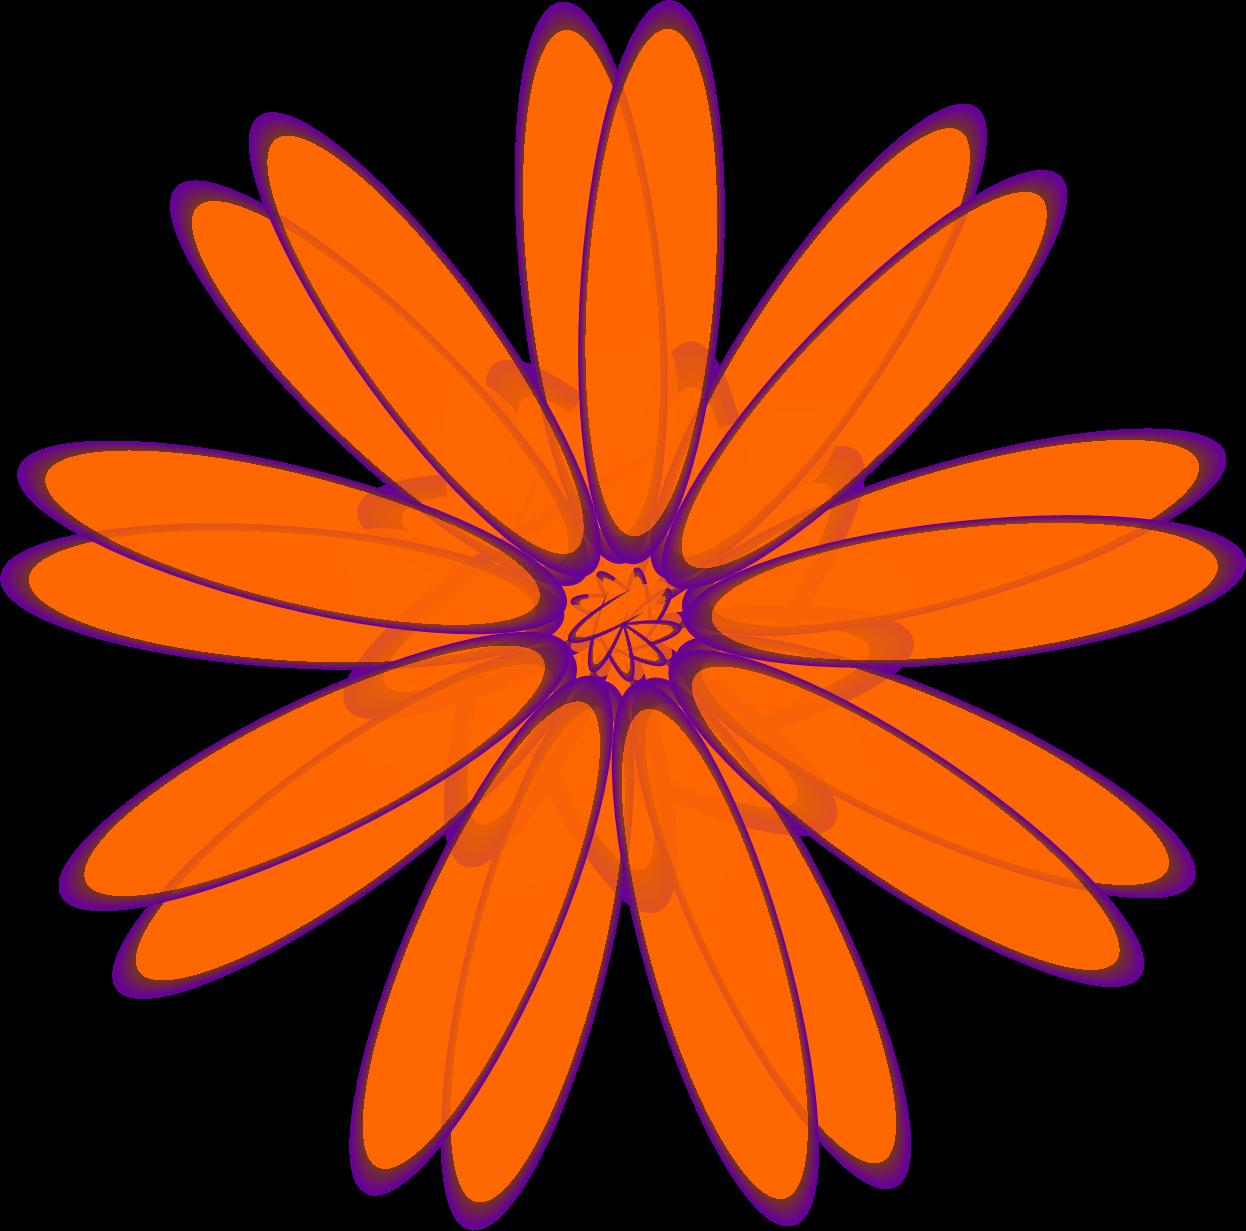 Daisies clipart orange. Daisy big image png